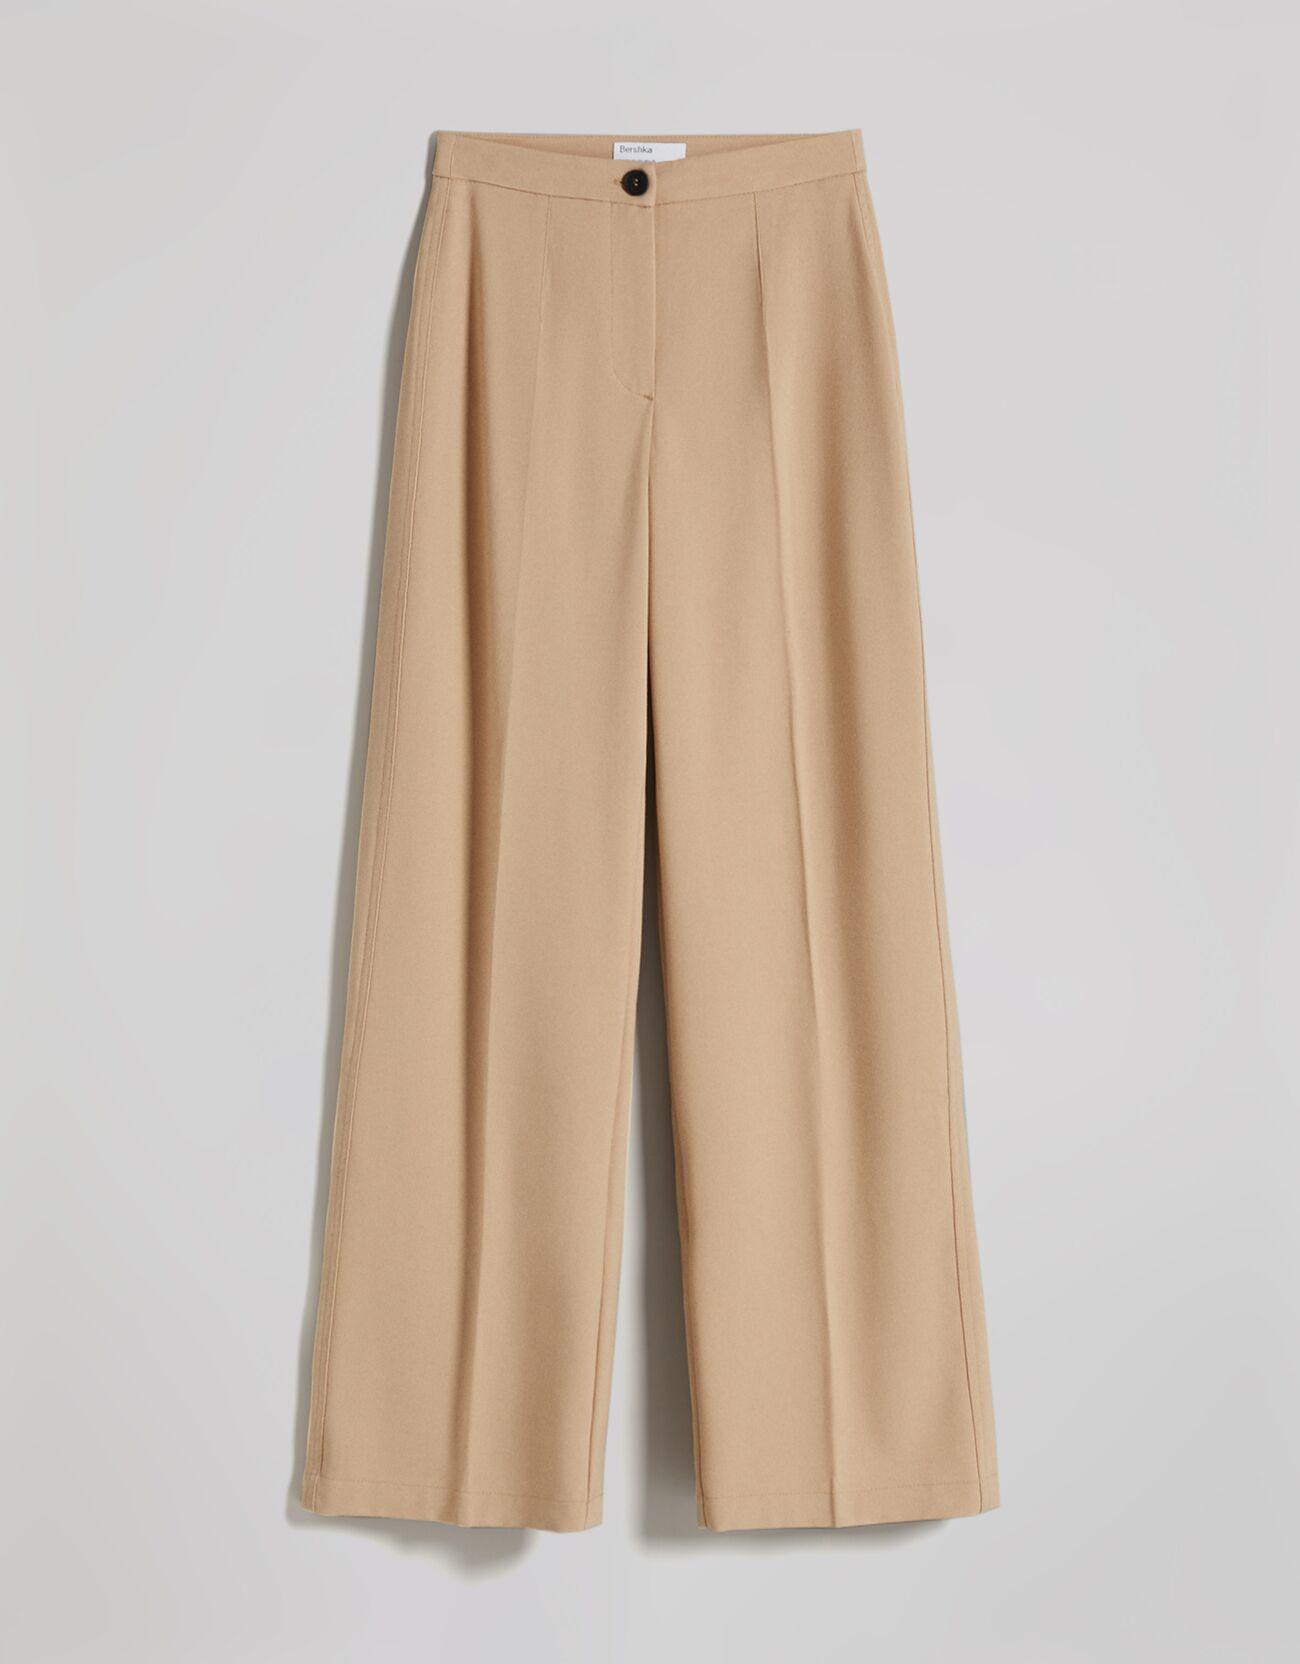 Широкие брюки с карманом сзади Верблюжий Bershka